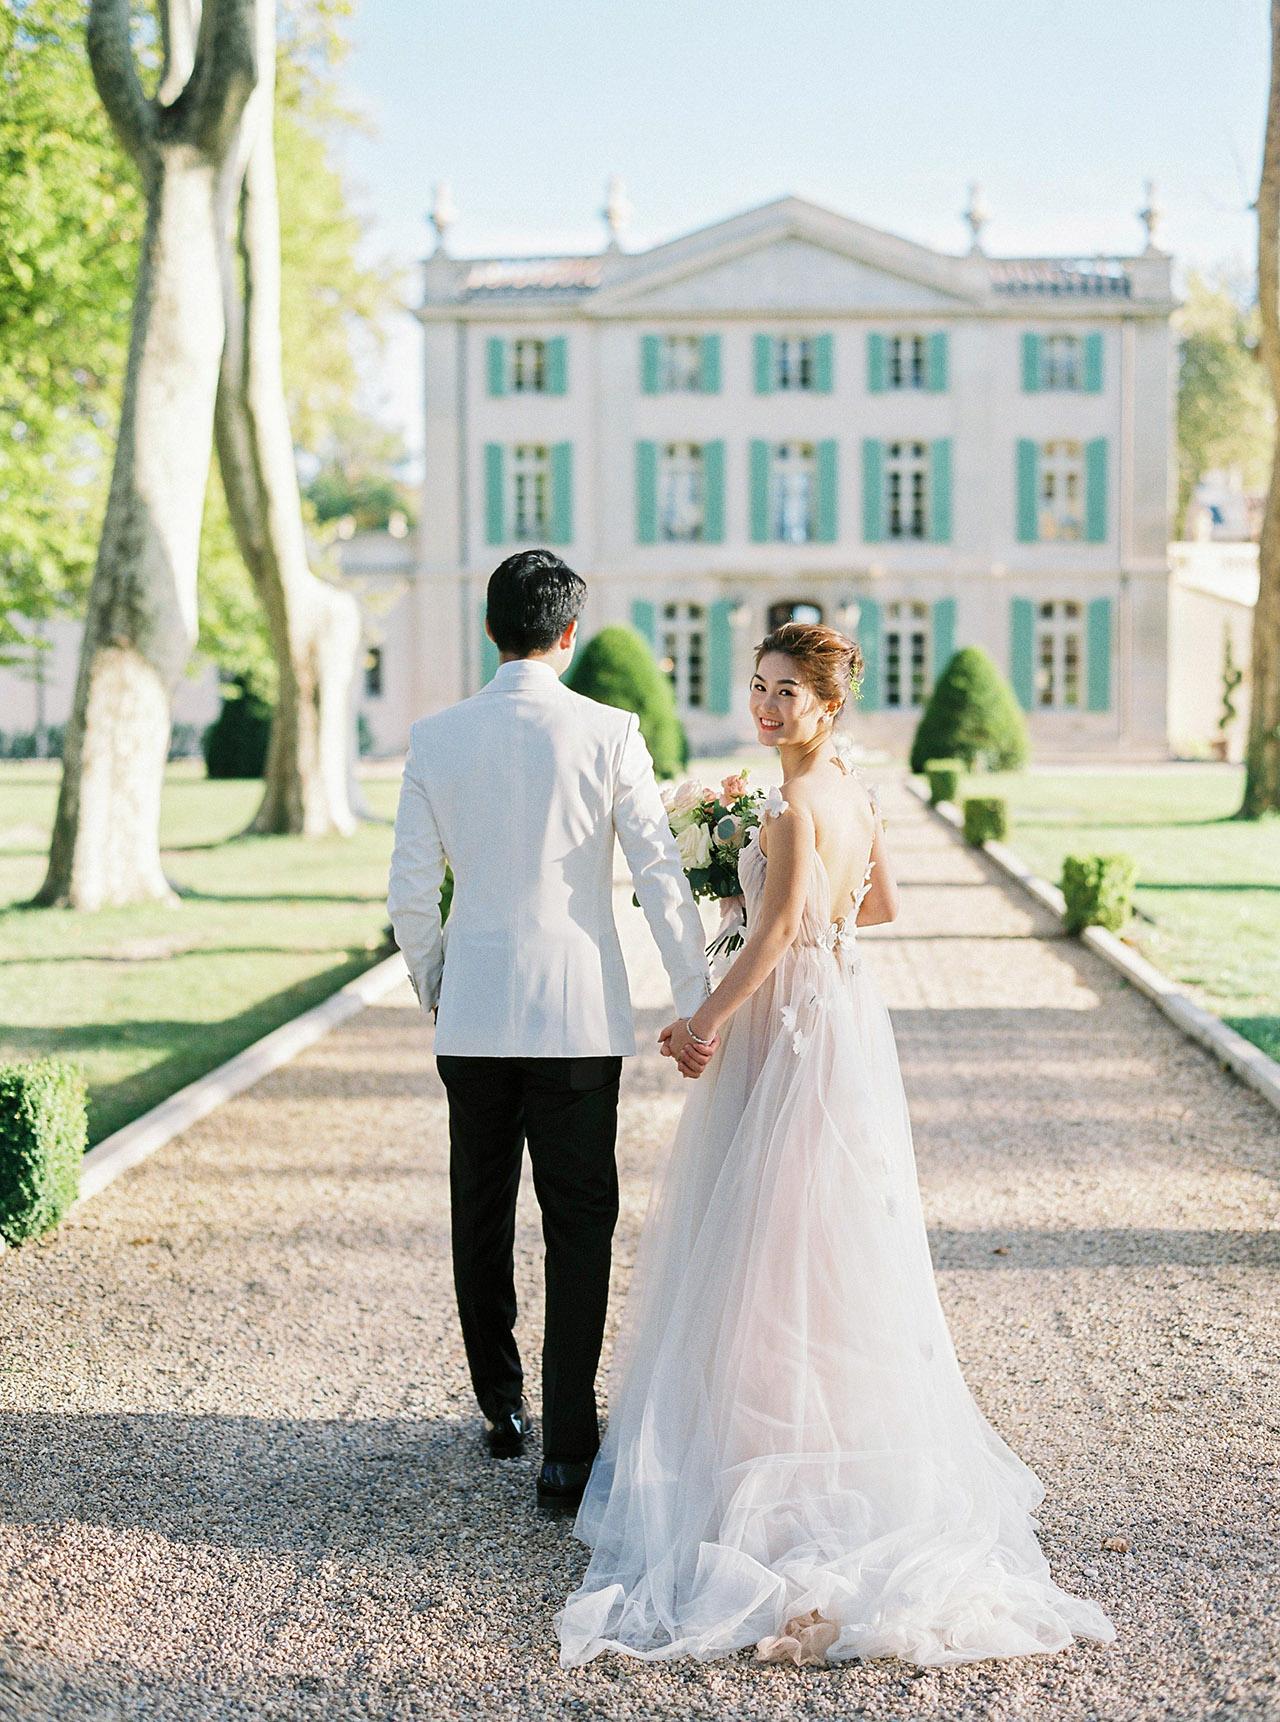 nancy sangho wedding couple walking